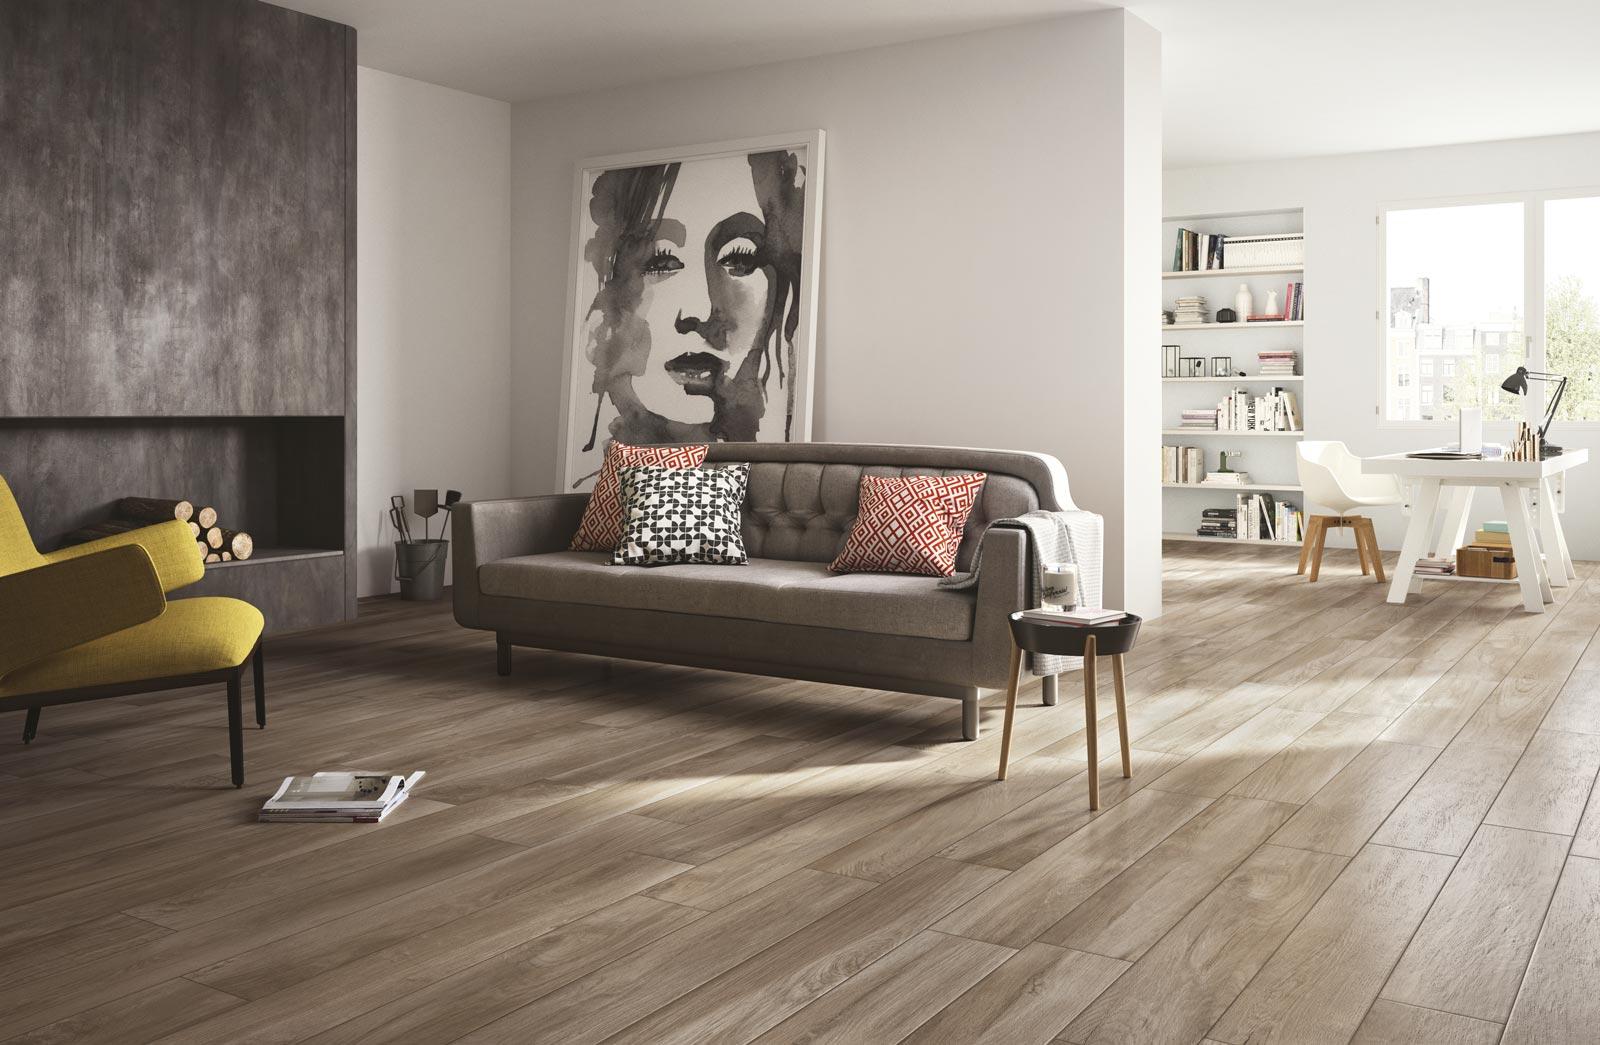 Woodplace wood effect porcelain stoneware ragno for Carrelage salle de bain tendance 2016